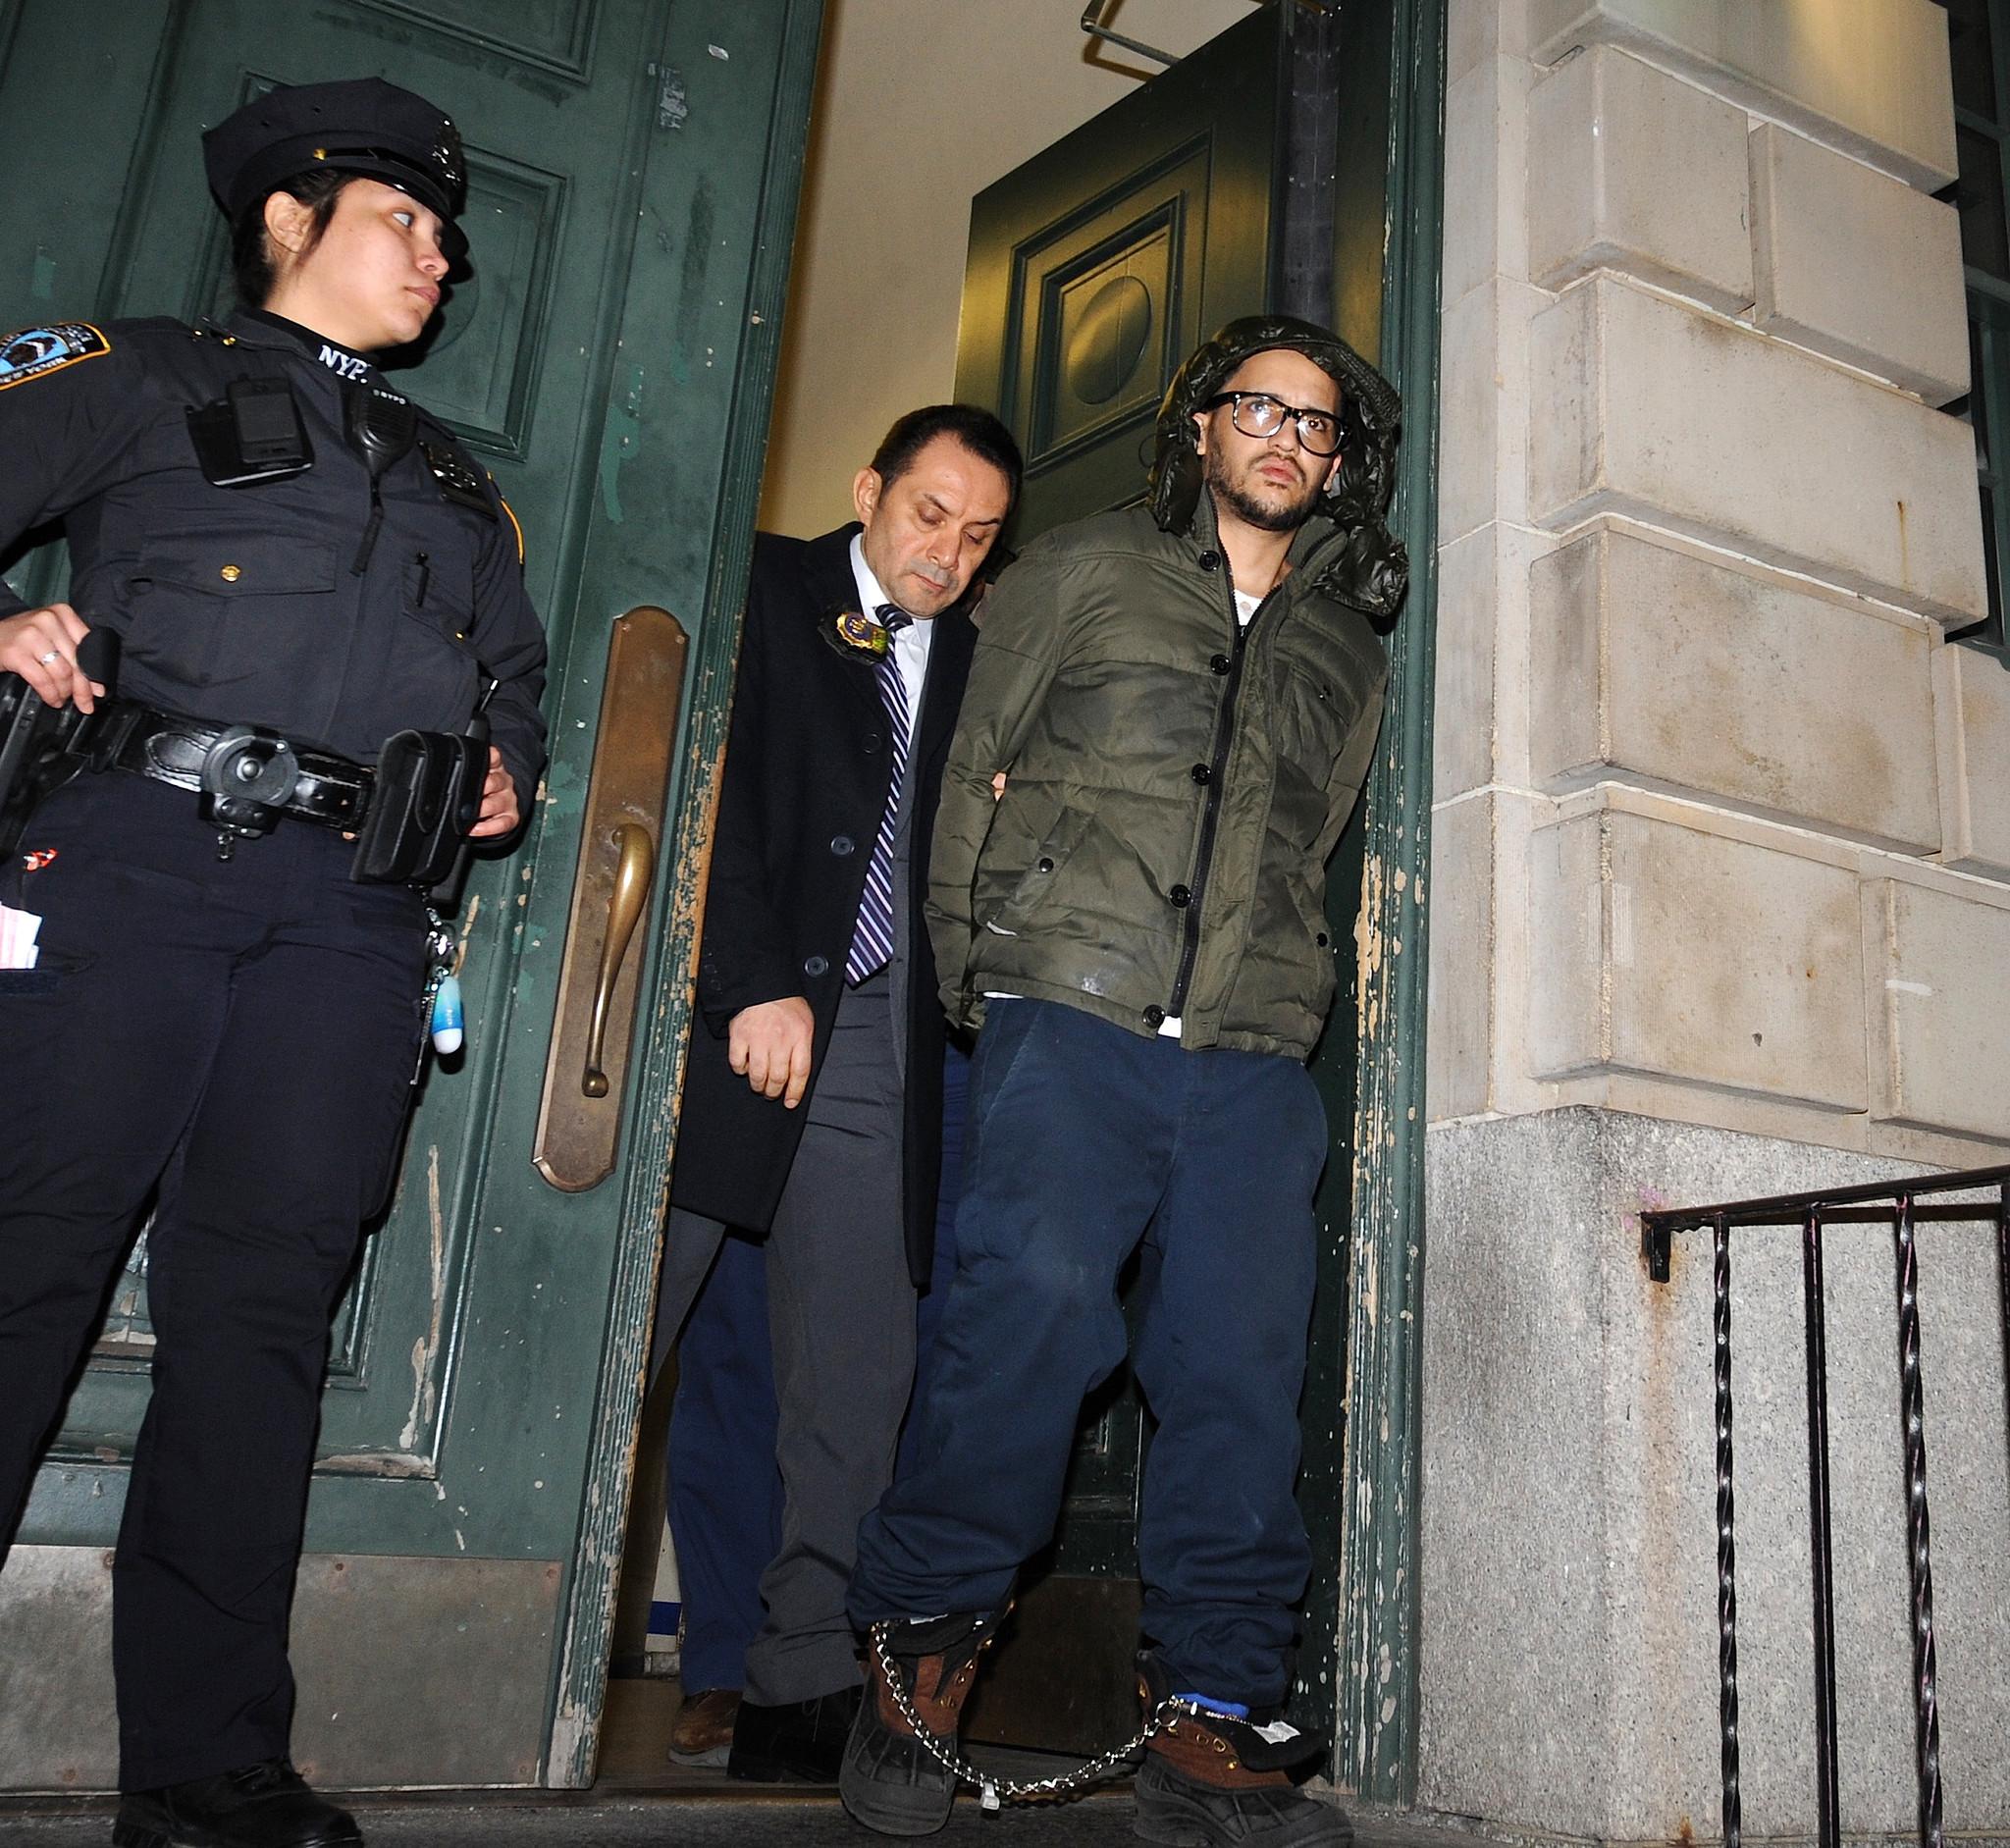 Cops arrest suspect in Bronx deli worker's slaying